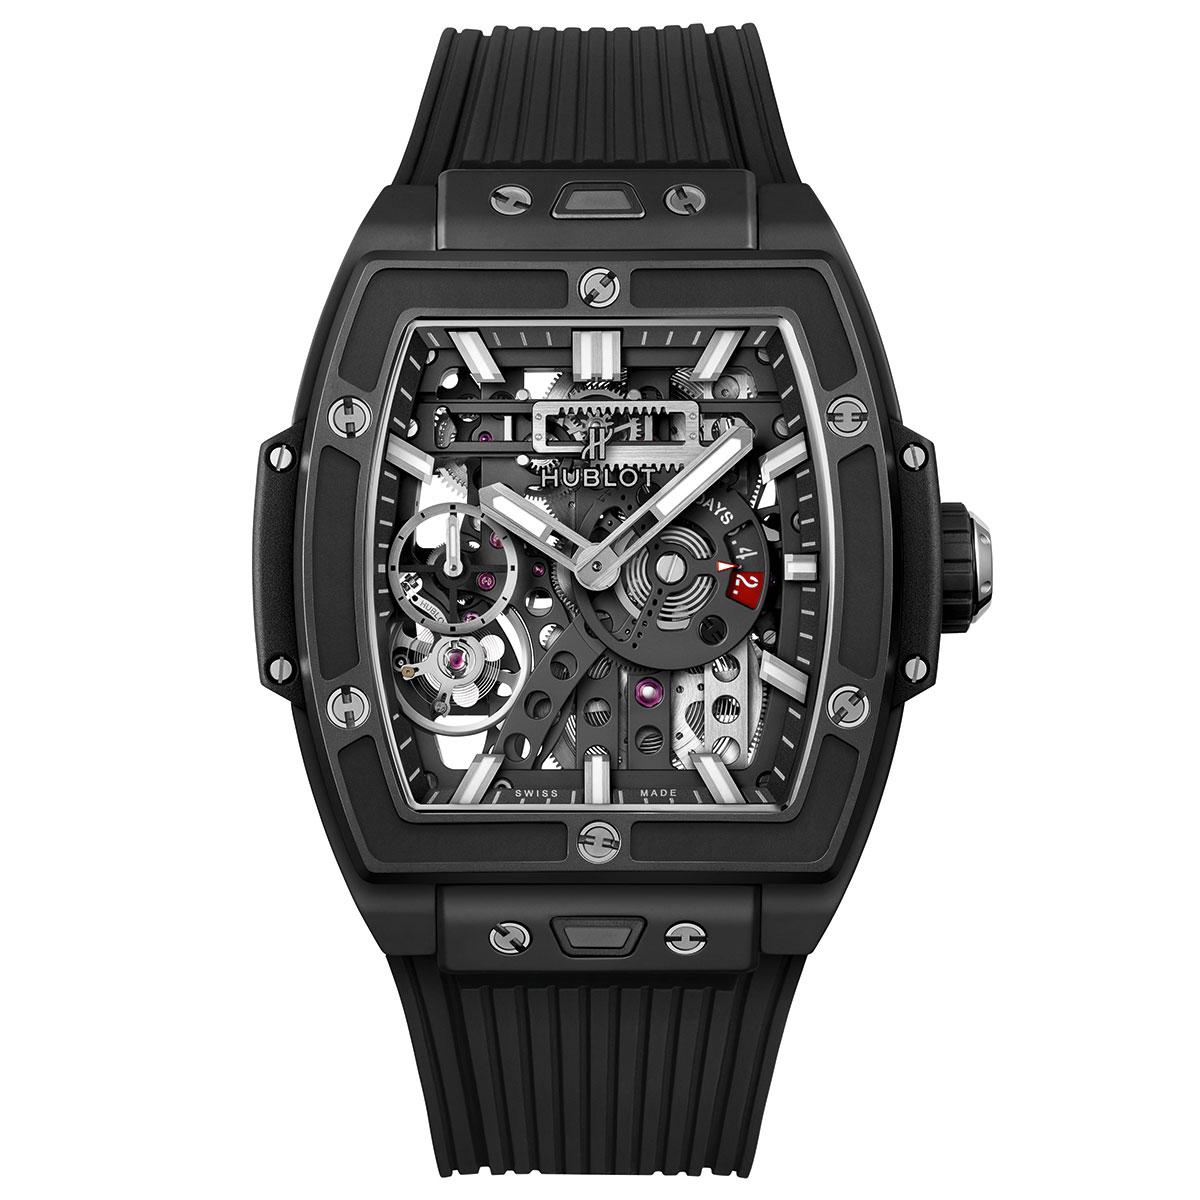 Hublot Spirit of Big Bang Meca-10 Black Magic 45mm Watch